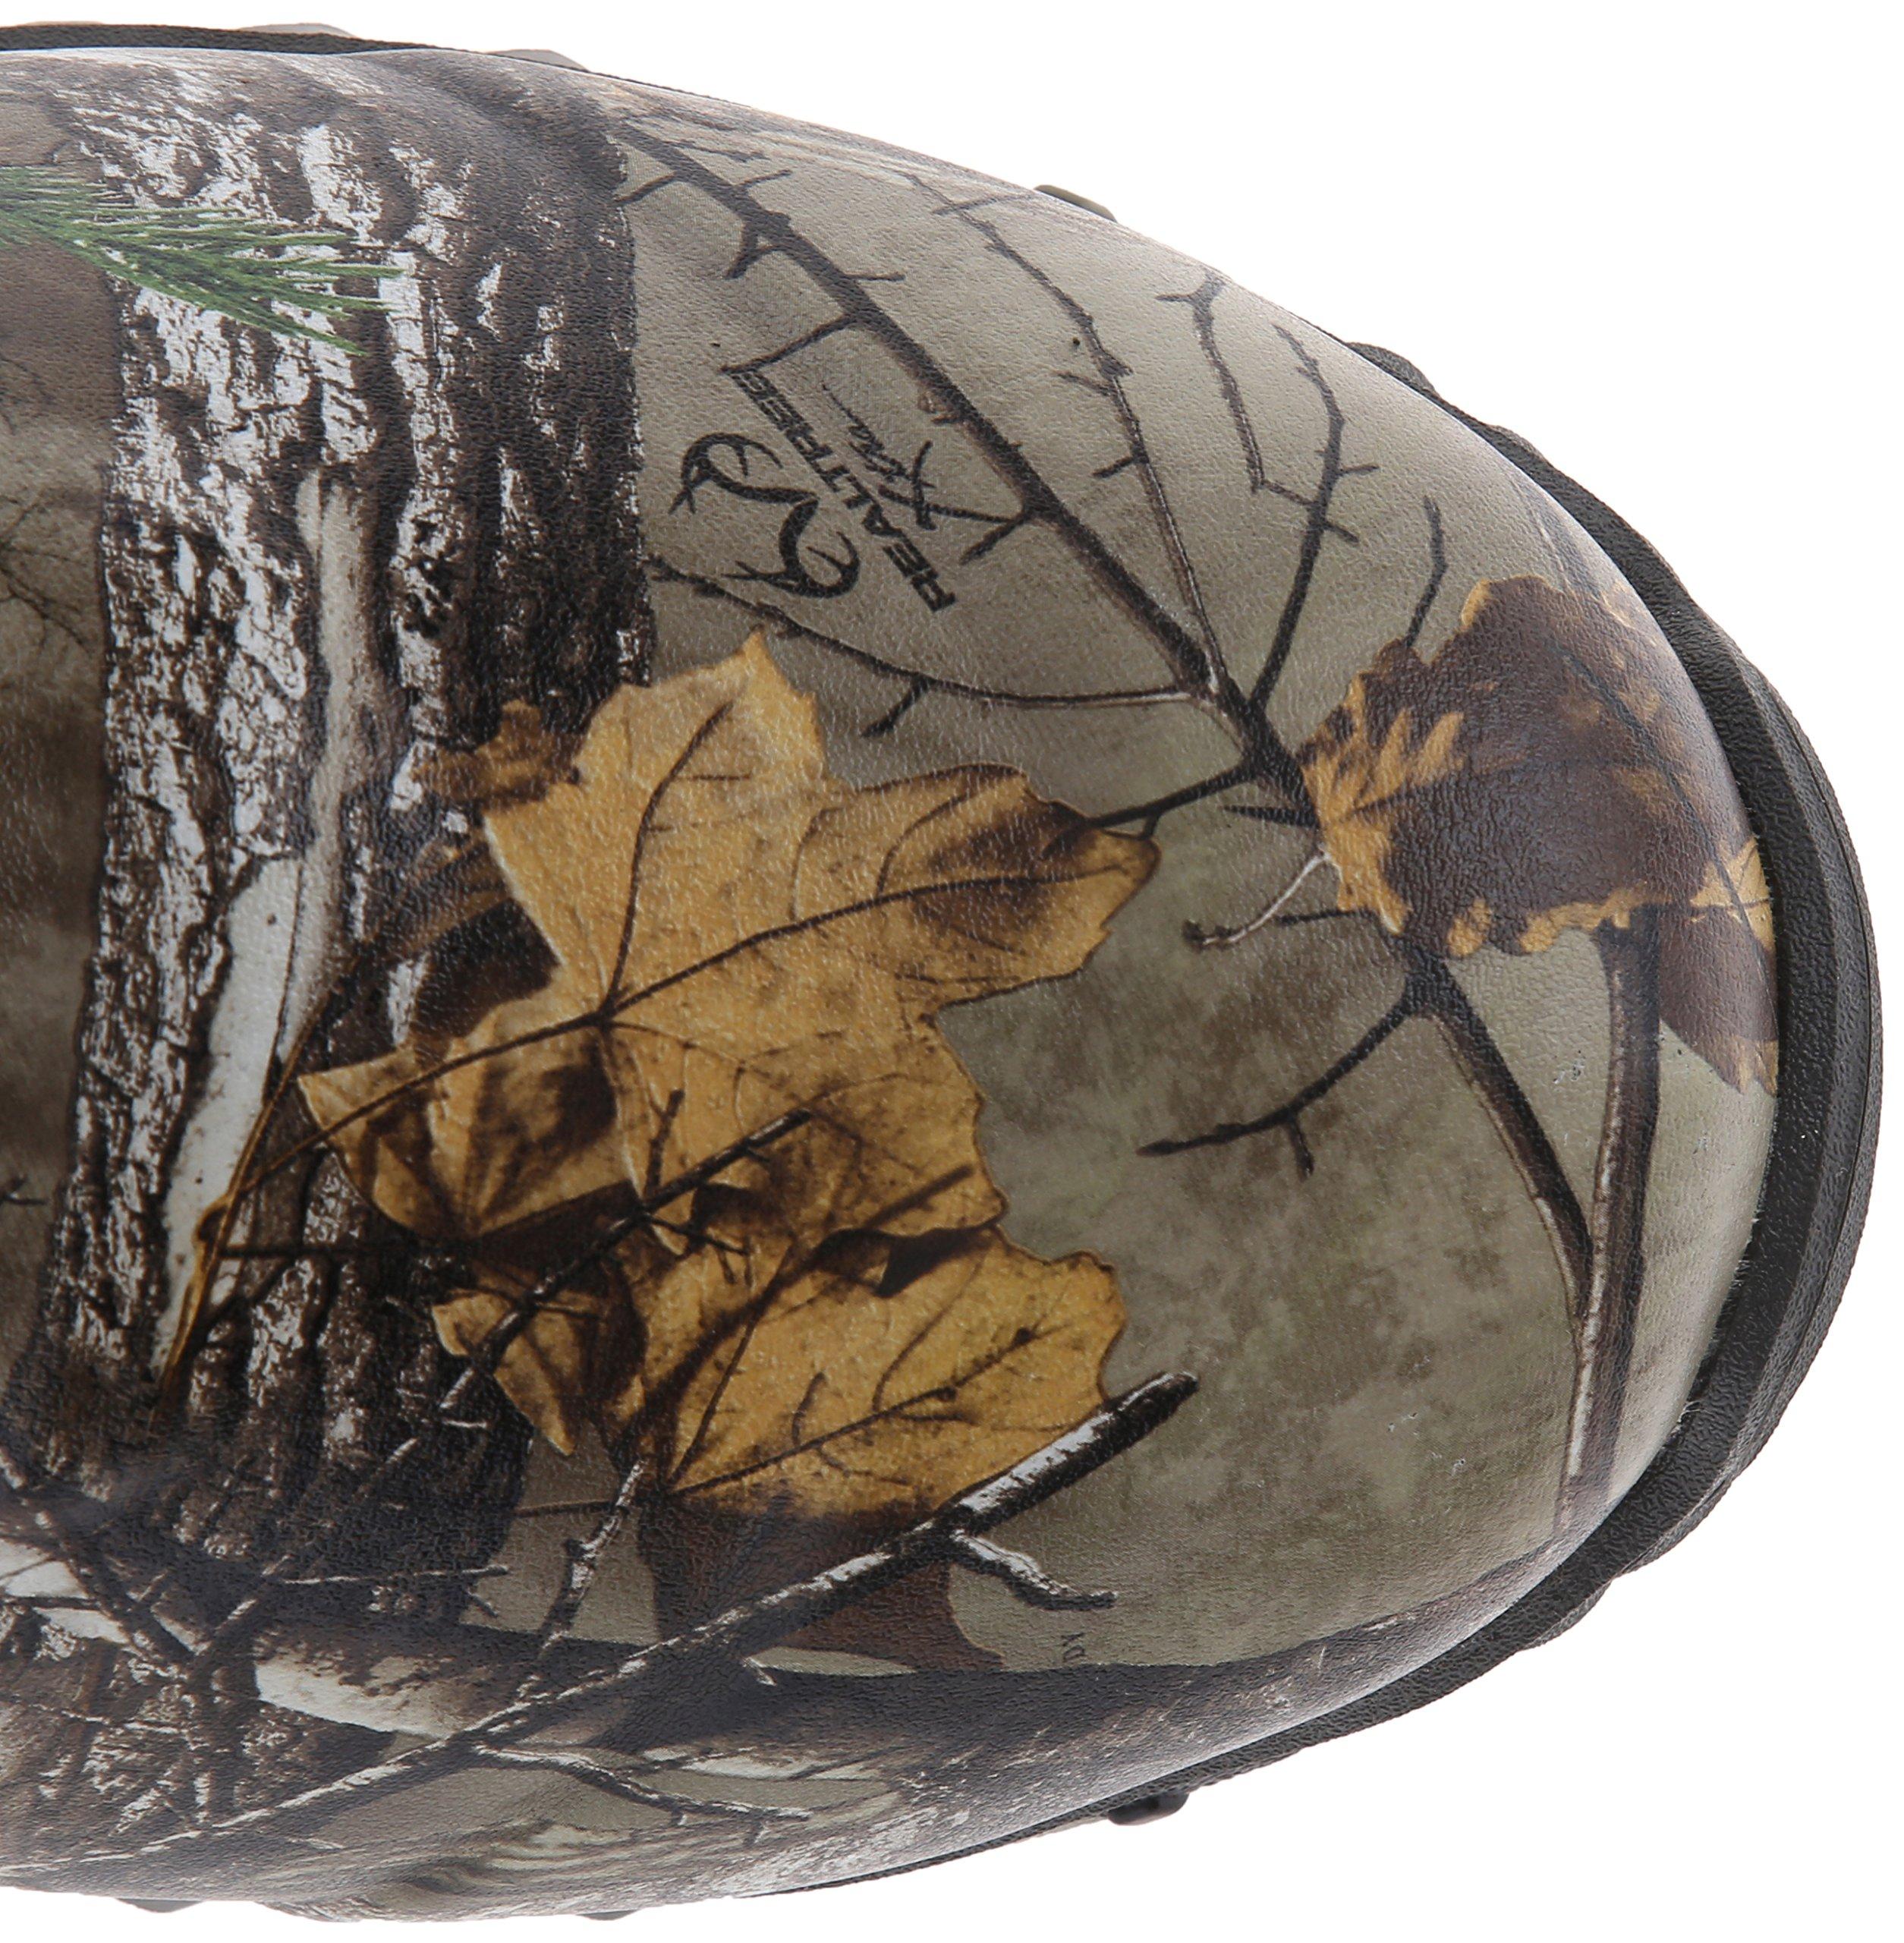 Irish Setter Men's 4881 Rutmaster 2.0 17'' 800-Gram Rubber Boot, Camo, 8 E US by Irish Setter (Image #7)